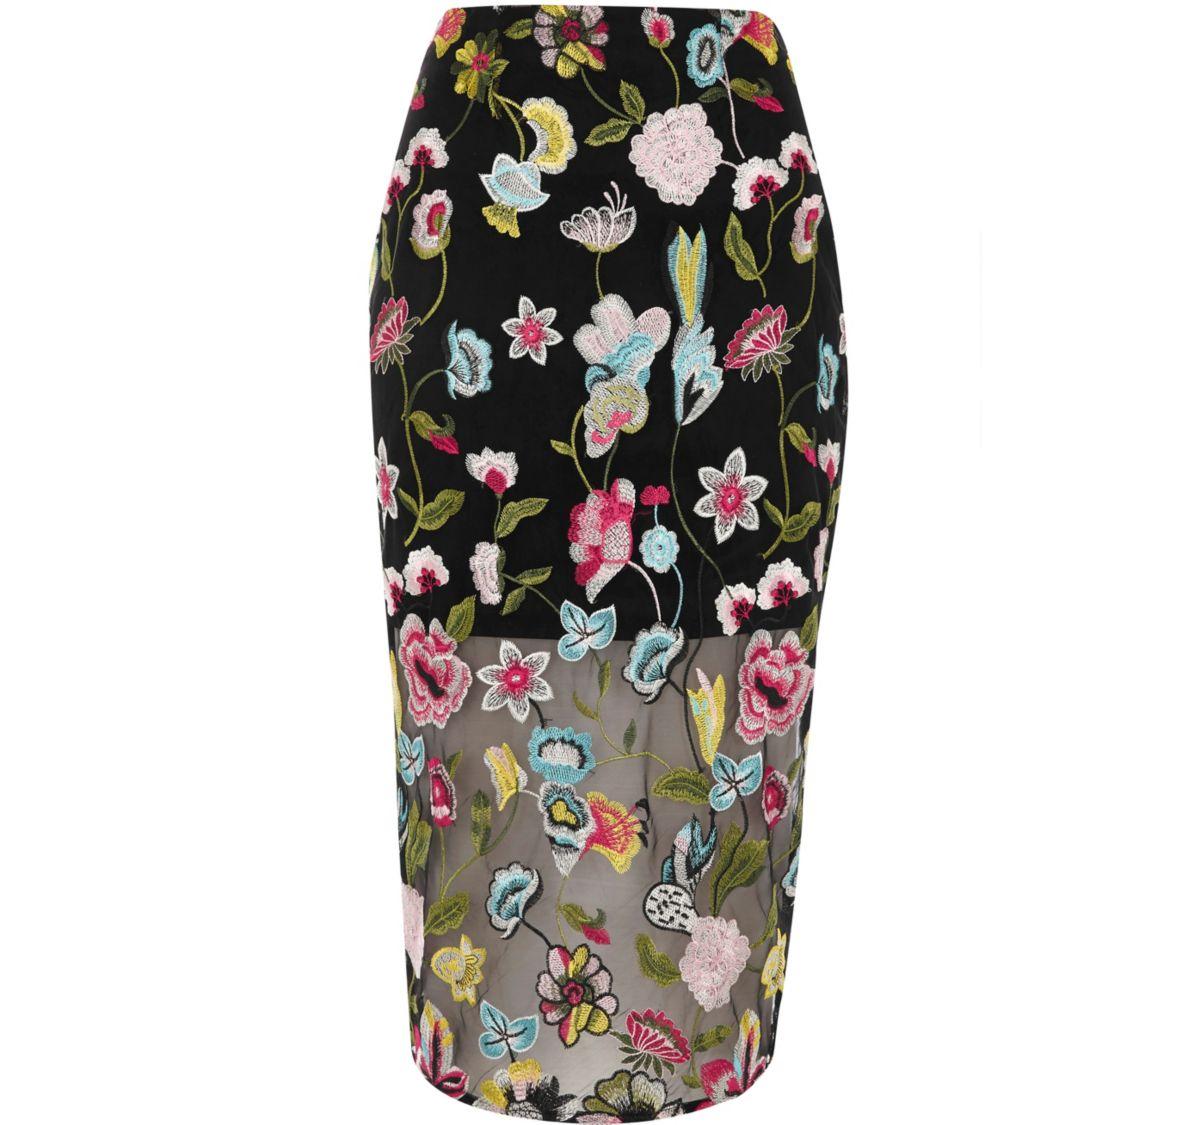 Black floral embroidered midi pencil skirt